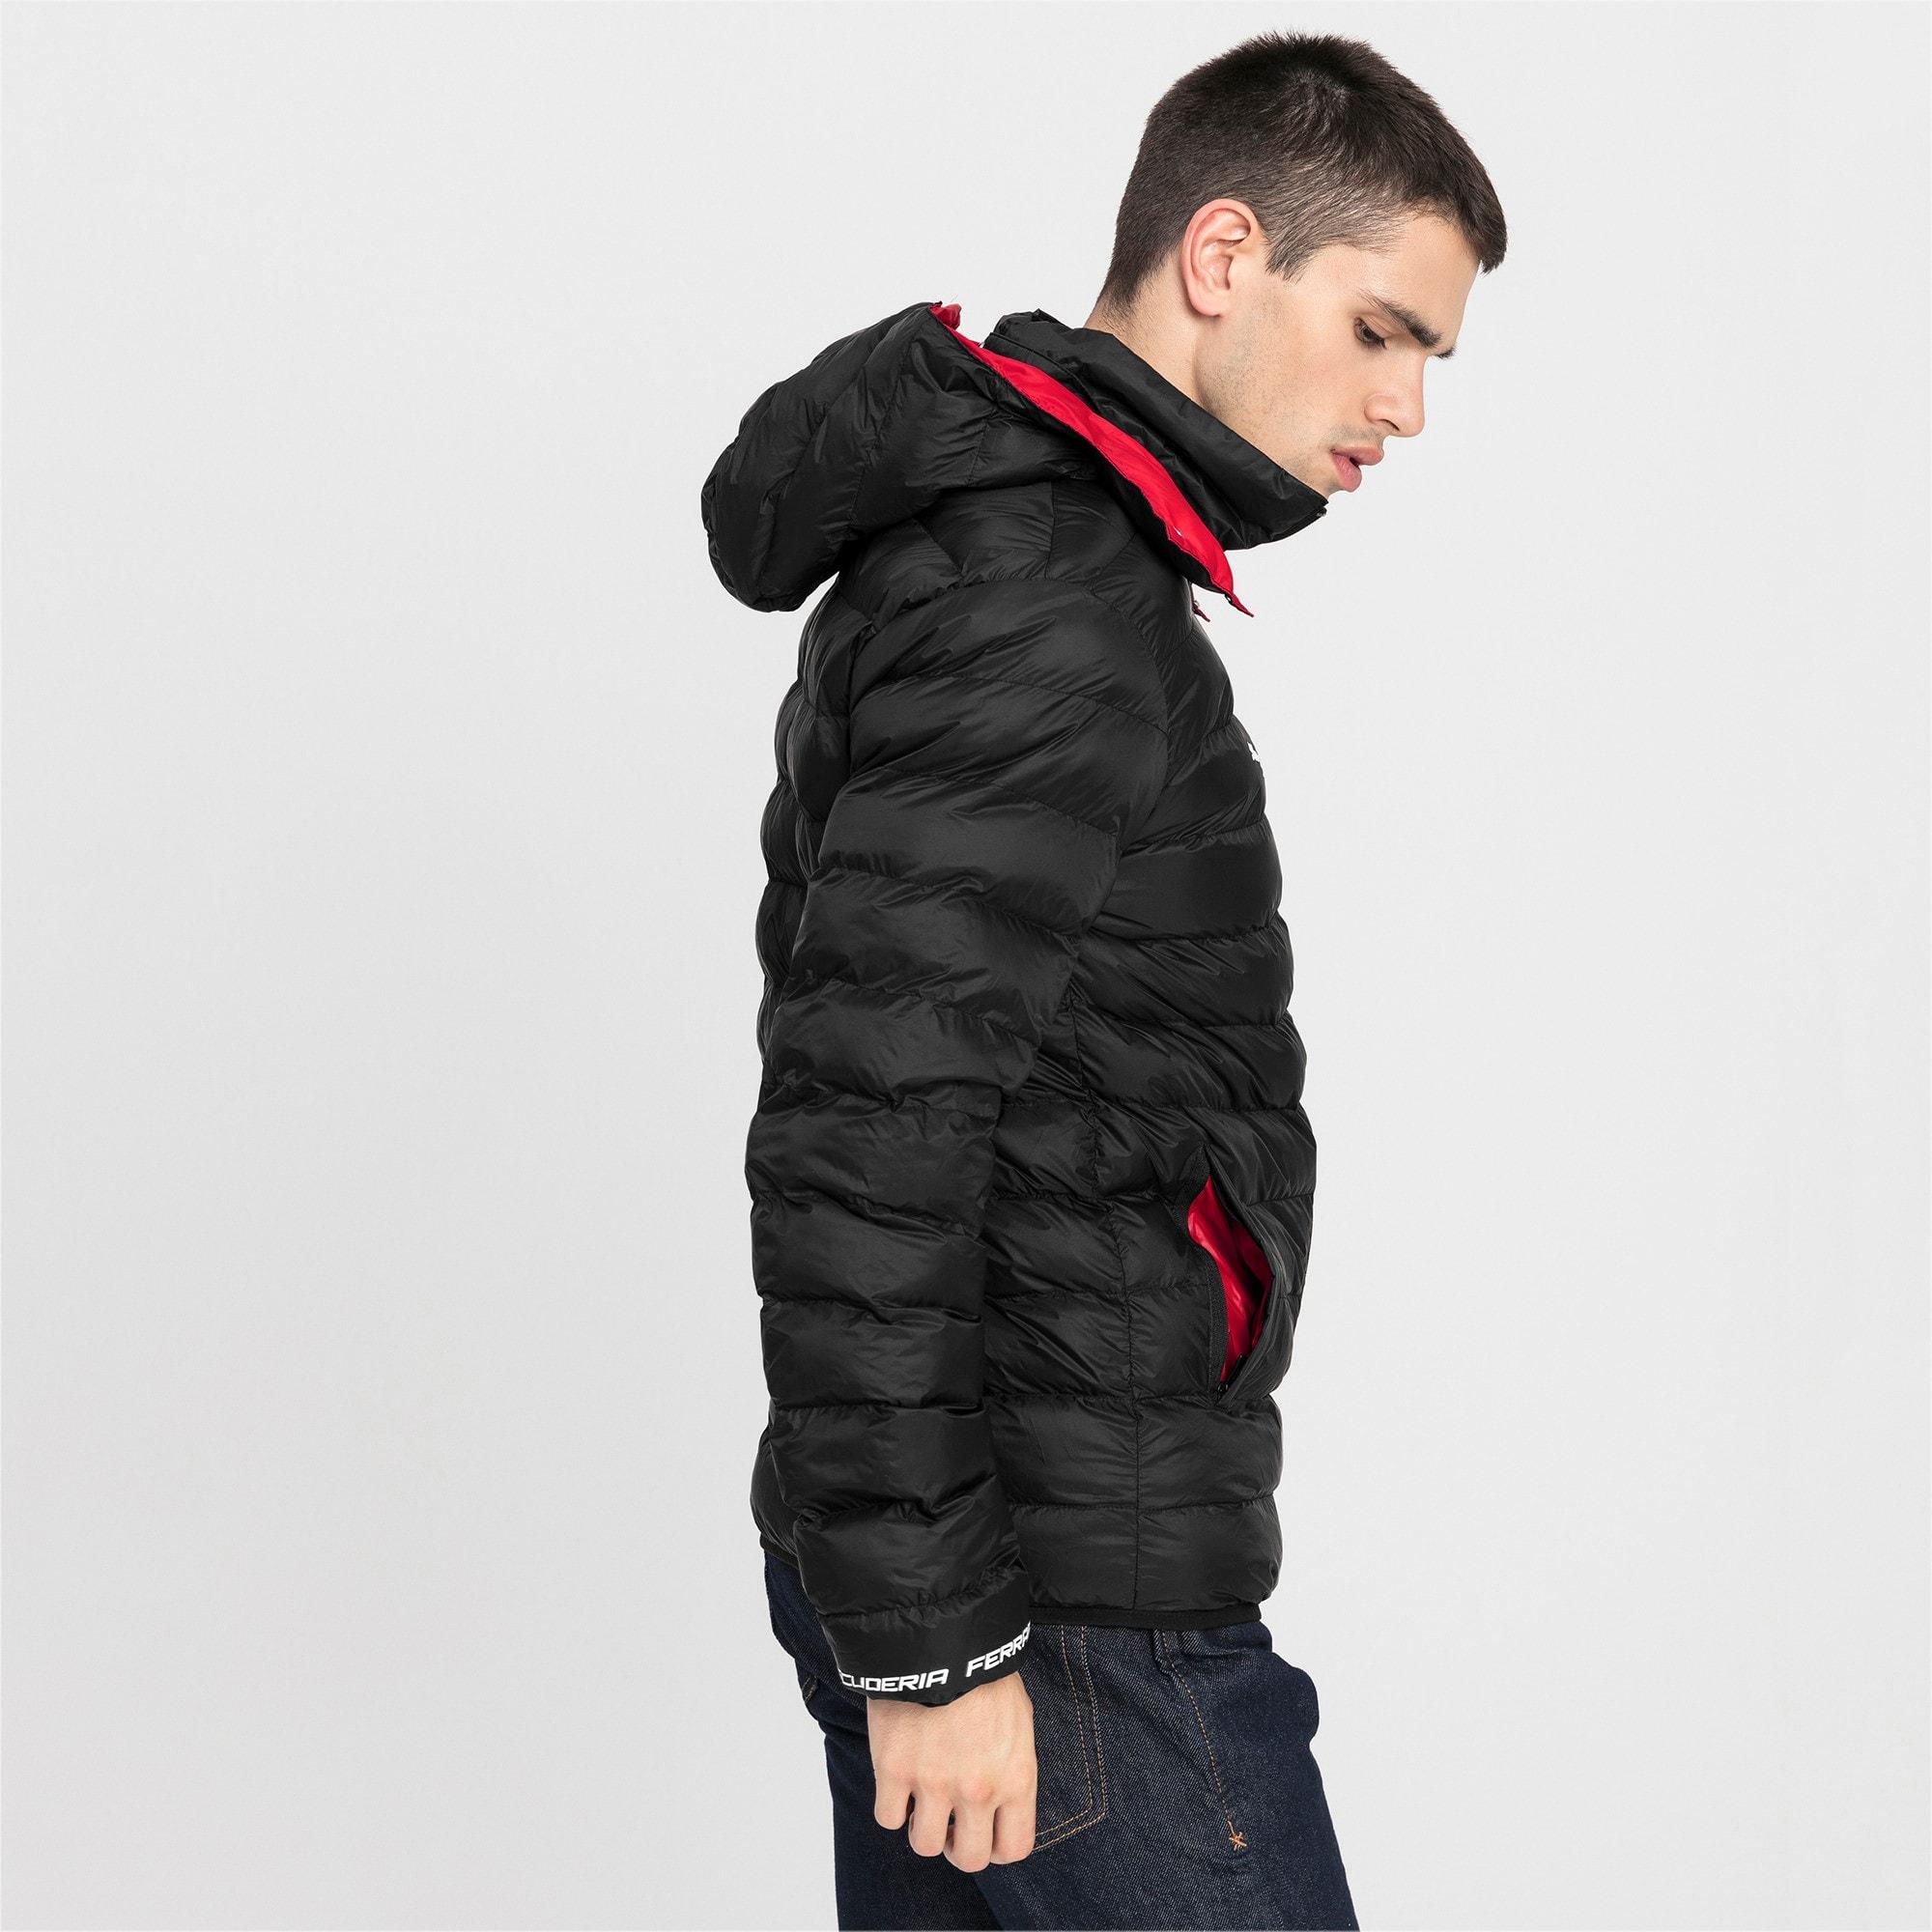 Thumbnail 2 van Ferrari Eco PackLITE jas voor mannen, Puma Black, medium